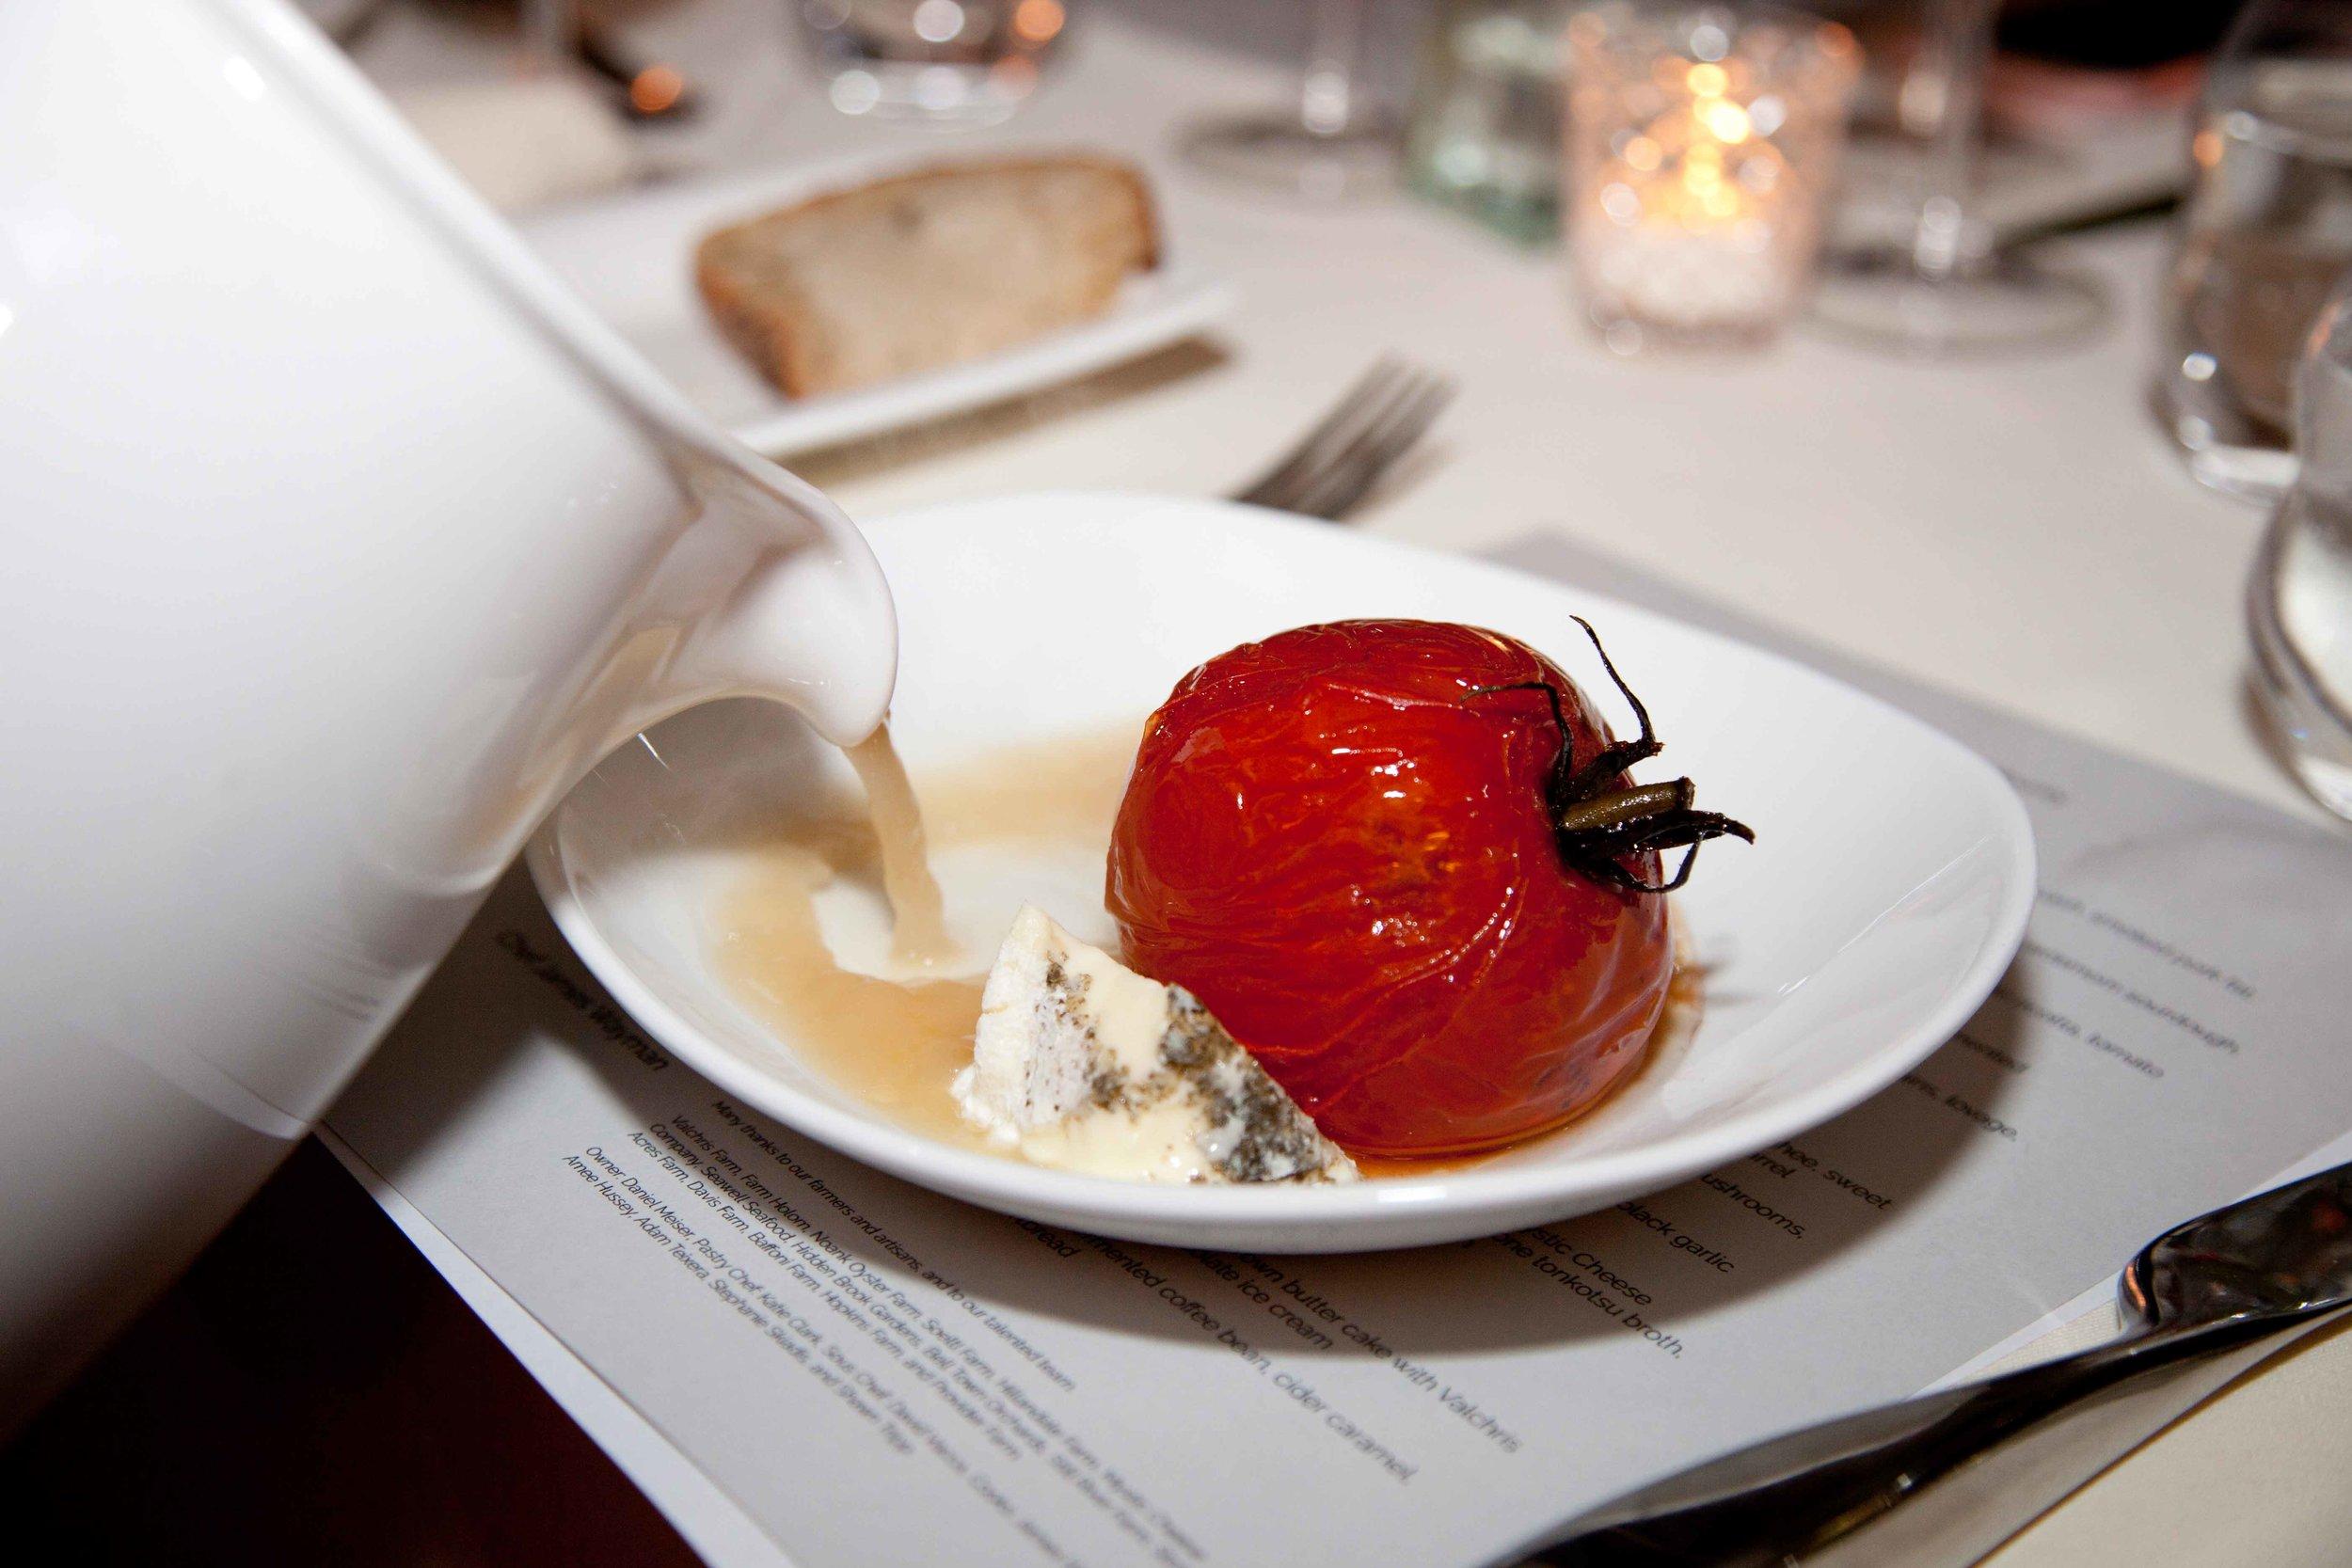 JBF-10-26-2016-Preserved-Whole-Tomato-04.jpg